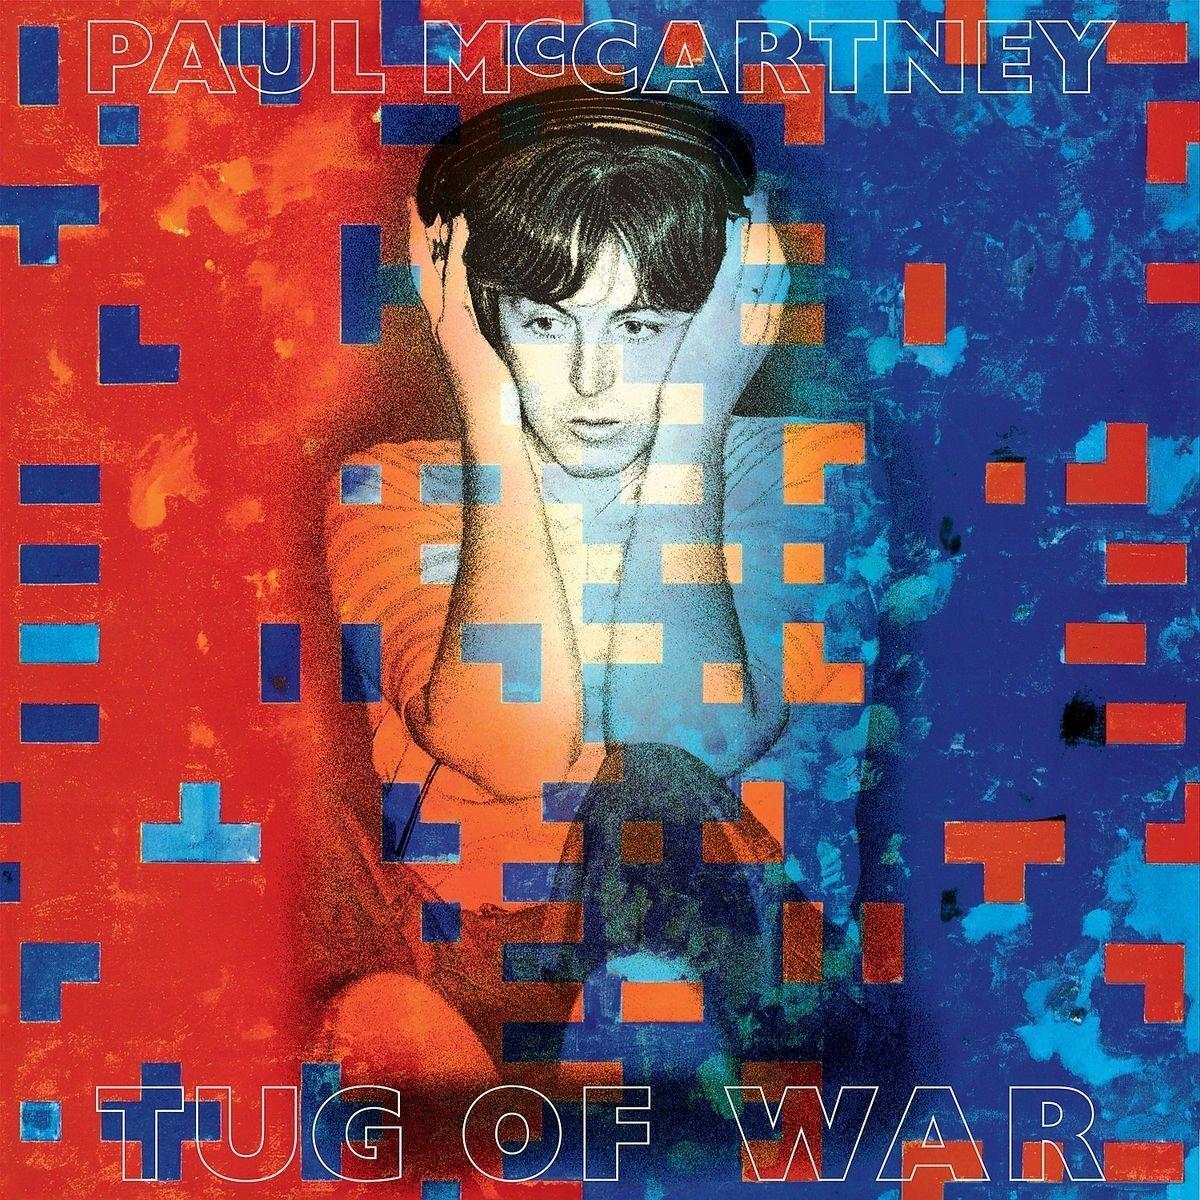 PAUL MCCARTNEY - TUG OF WAR (CD)